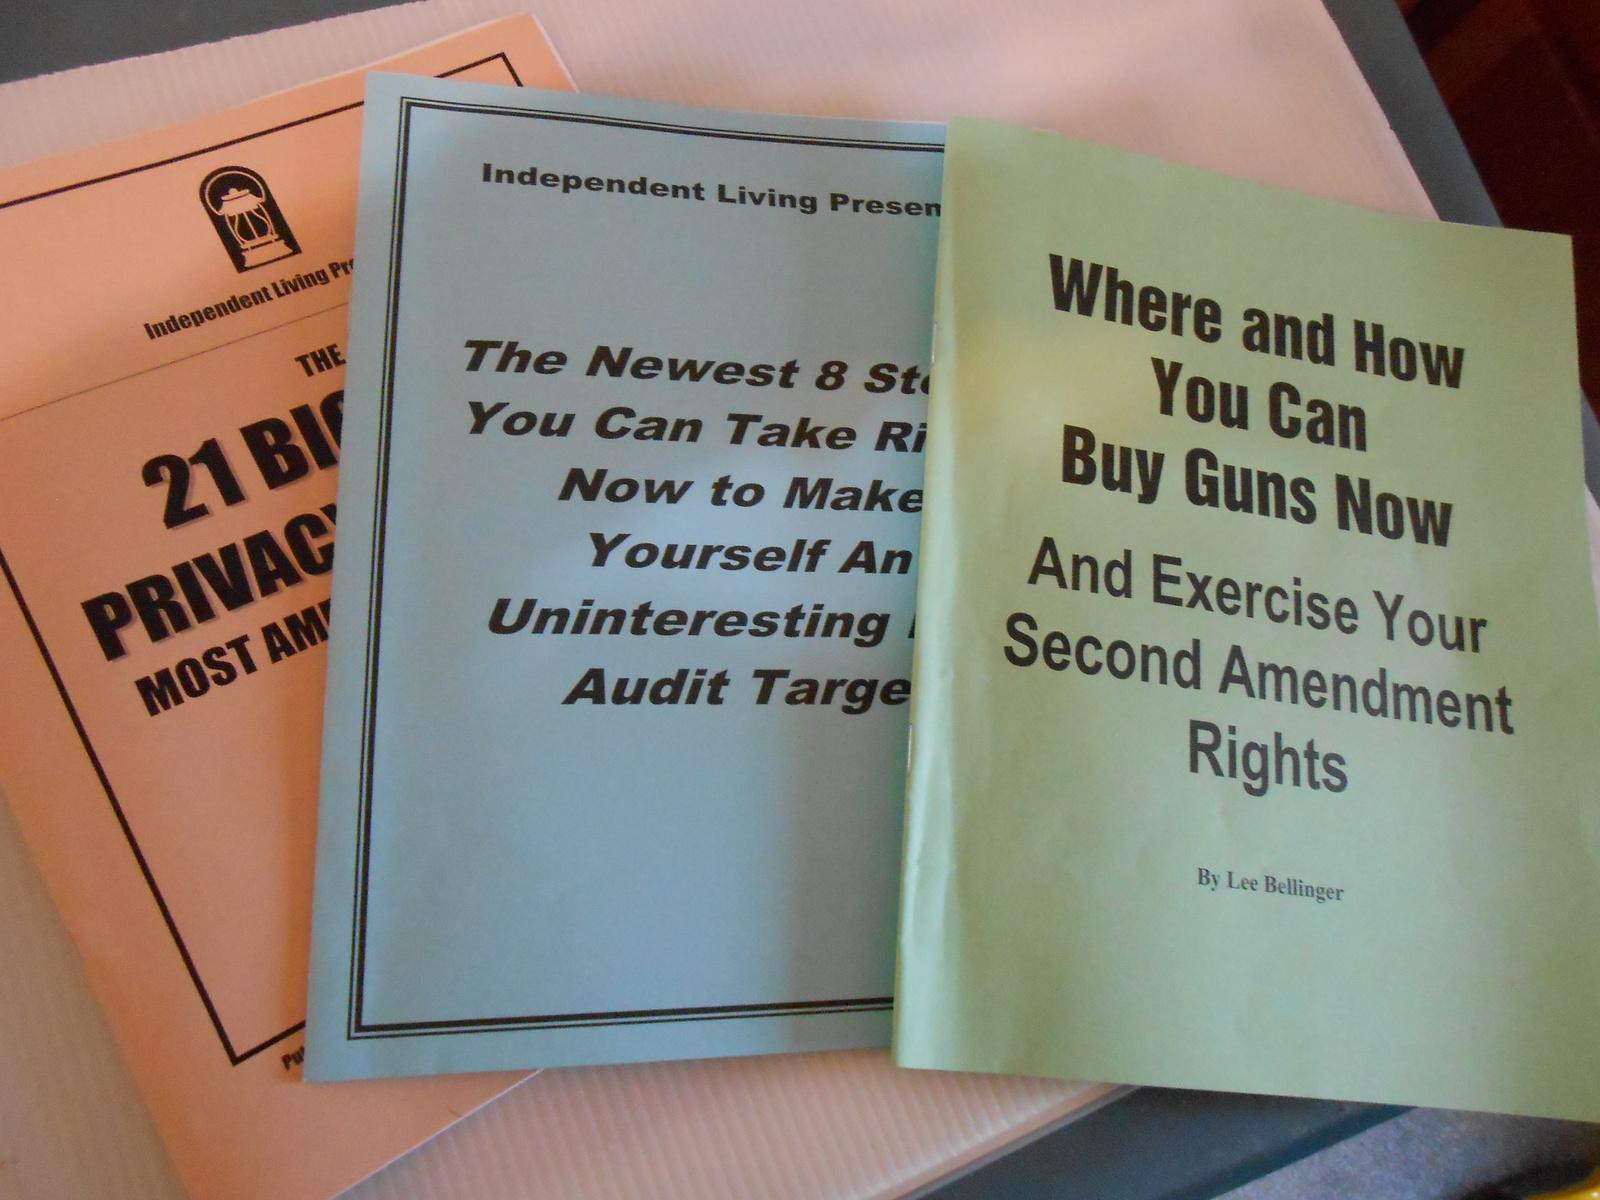 Ultimate Guide to Low Profile Living: 253 Cutting Edge Strategies to Reclaim Pri